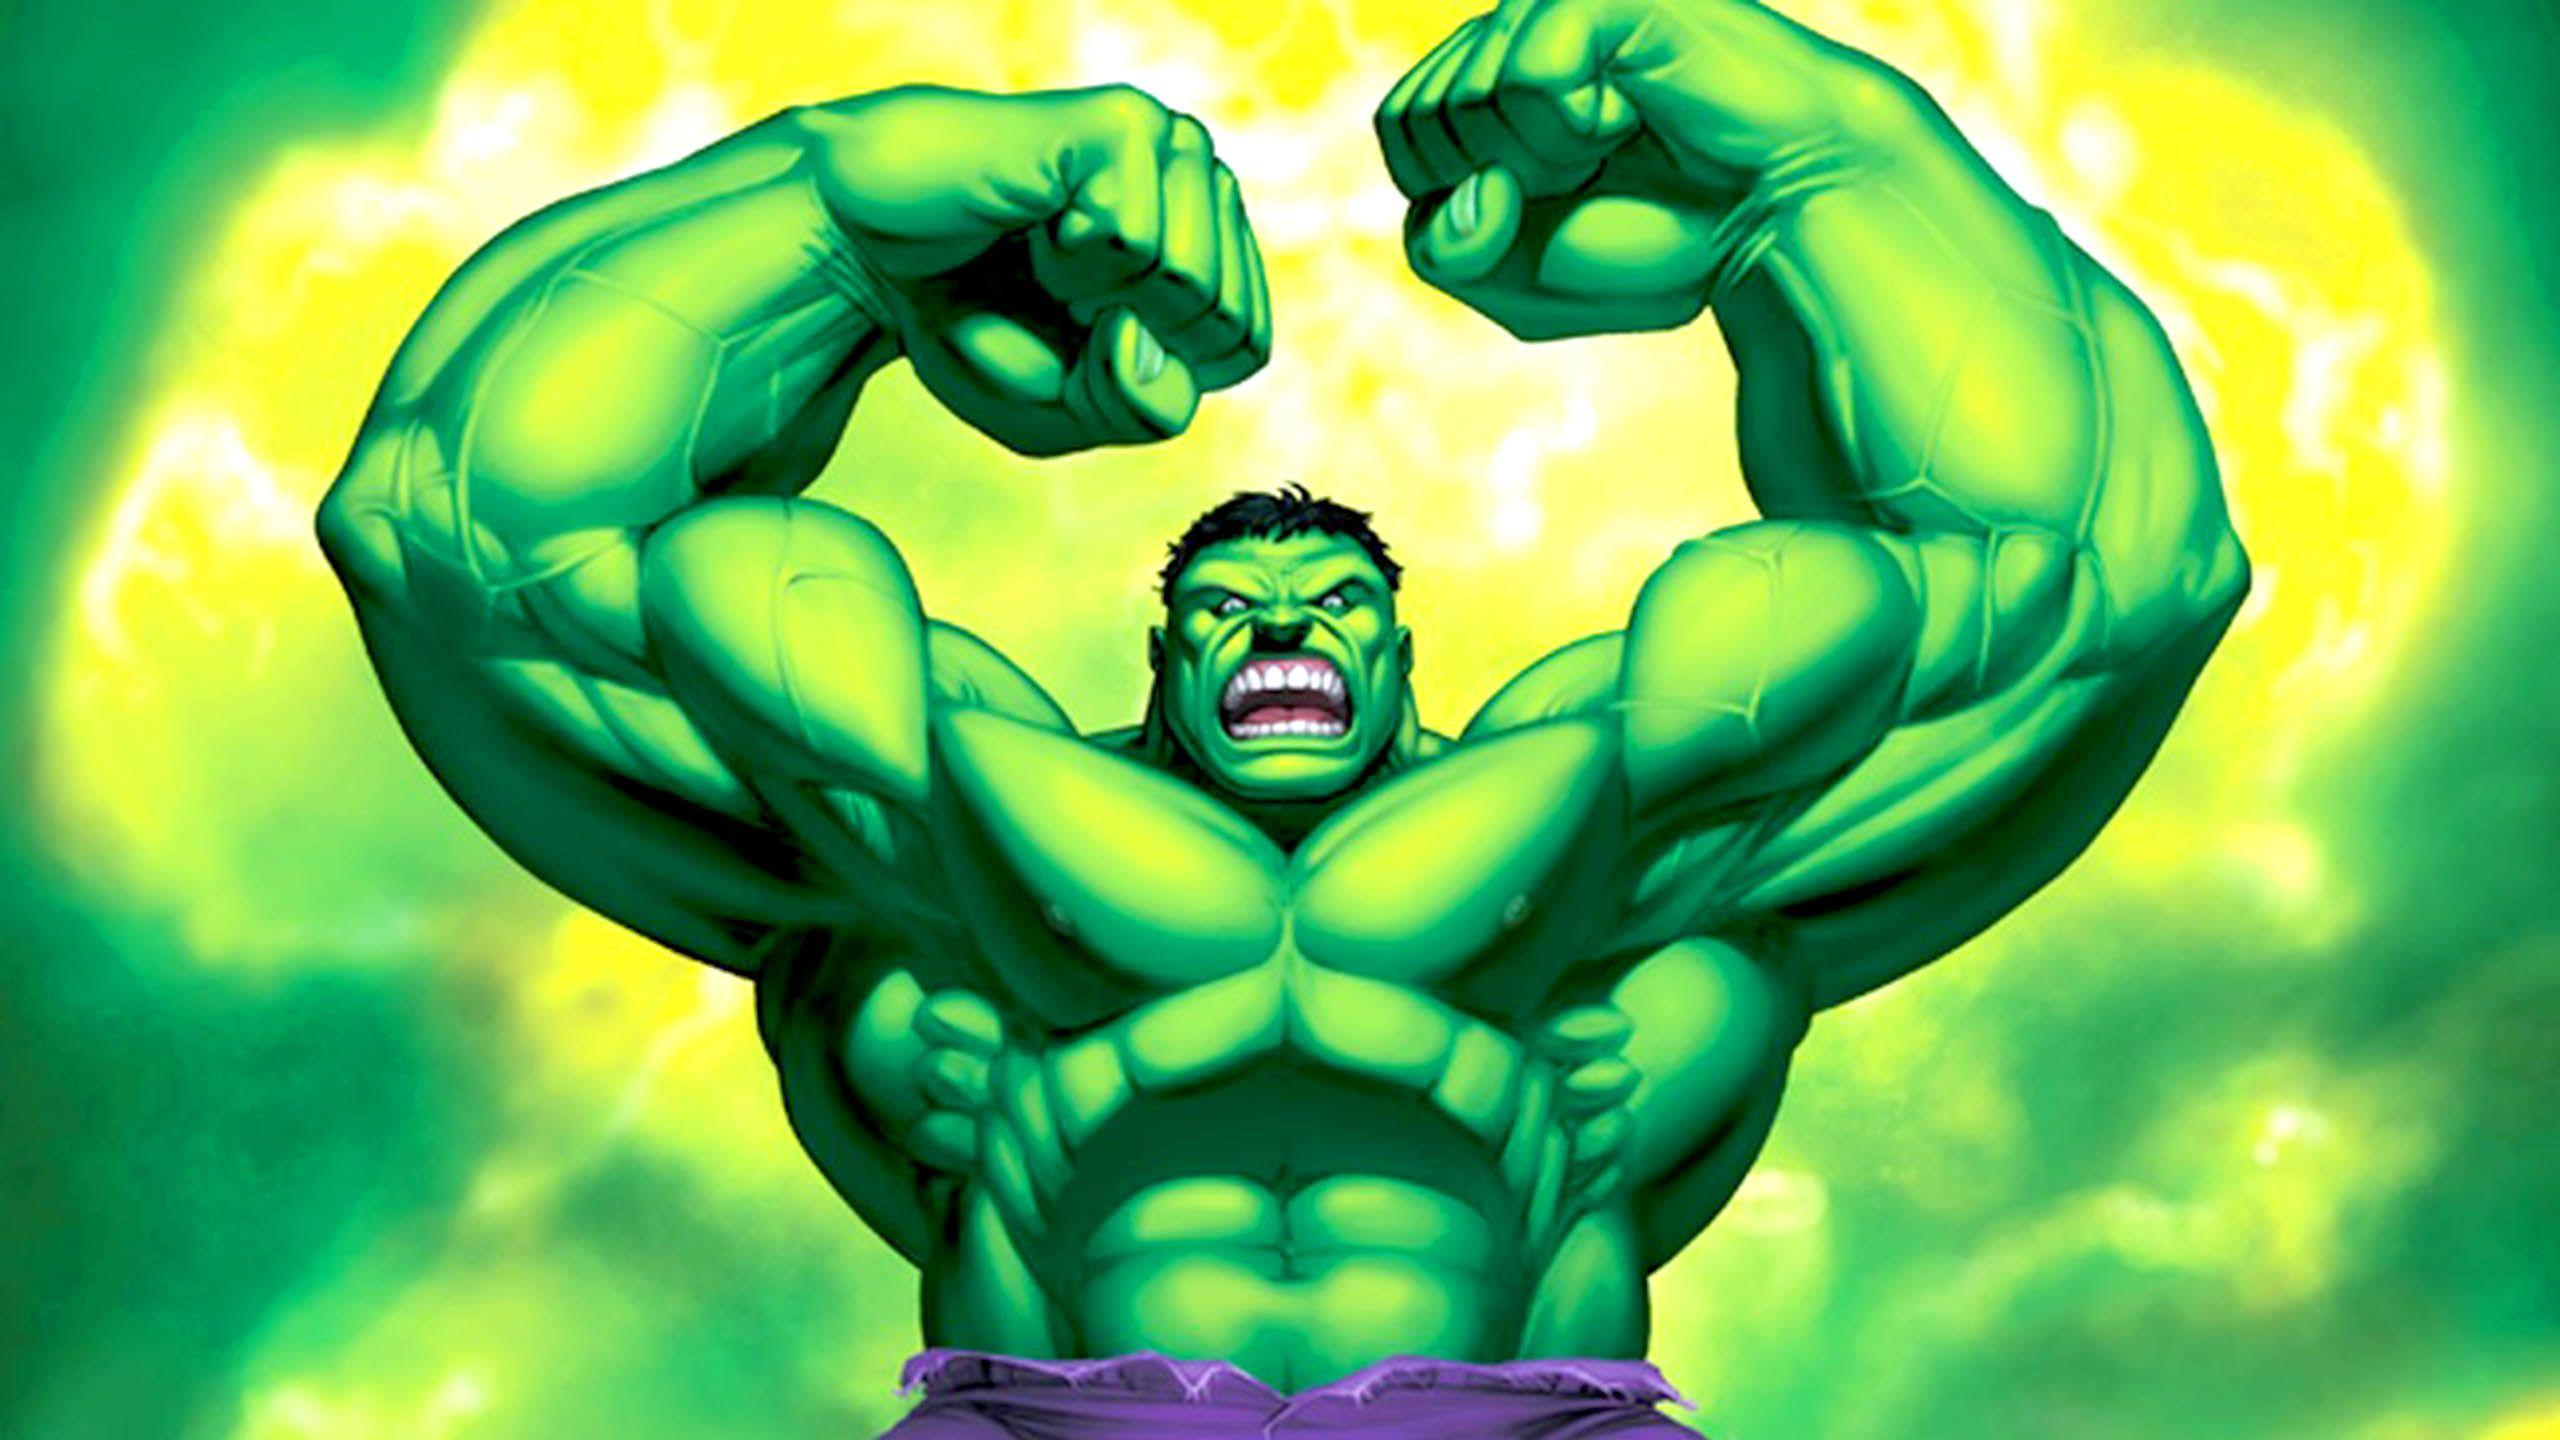 Best Wallpaper Marvel The Incredible Hulk - 2ee85b3a95ddc271956674e544d77010  Image_48983.jpg